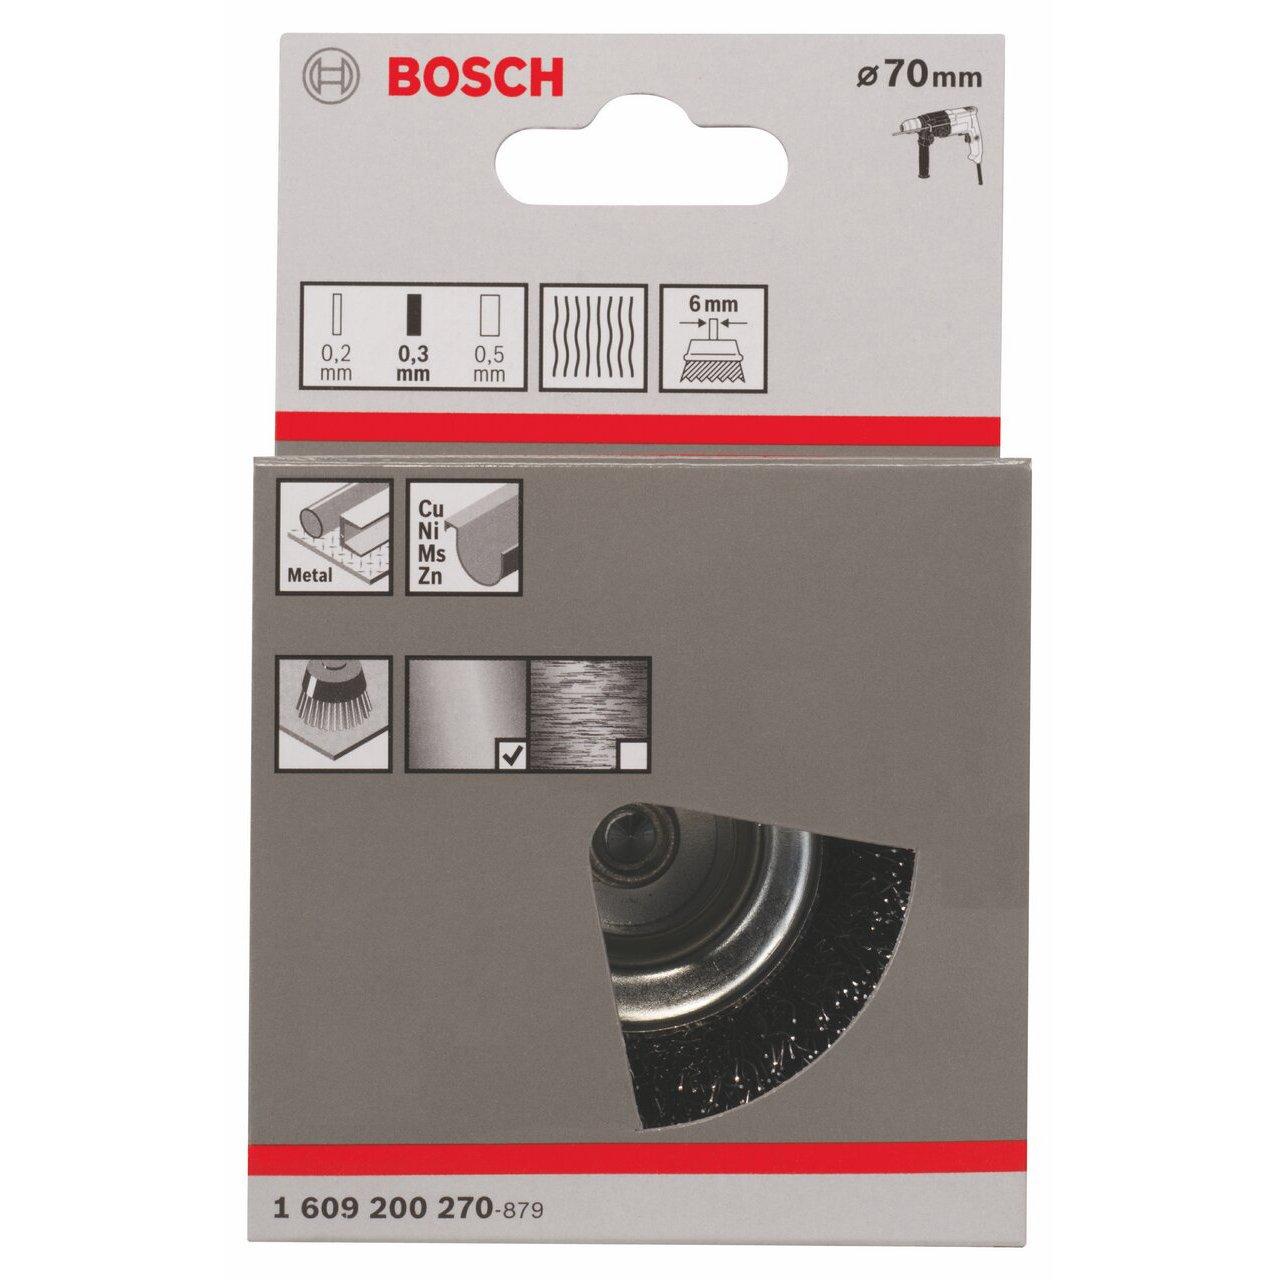 Bosch Professional 1609200270 Schleifzubeh/ör Topfb/ürste 70  mm Grob